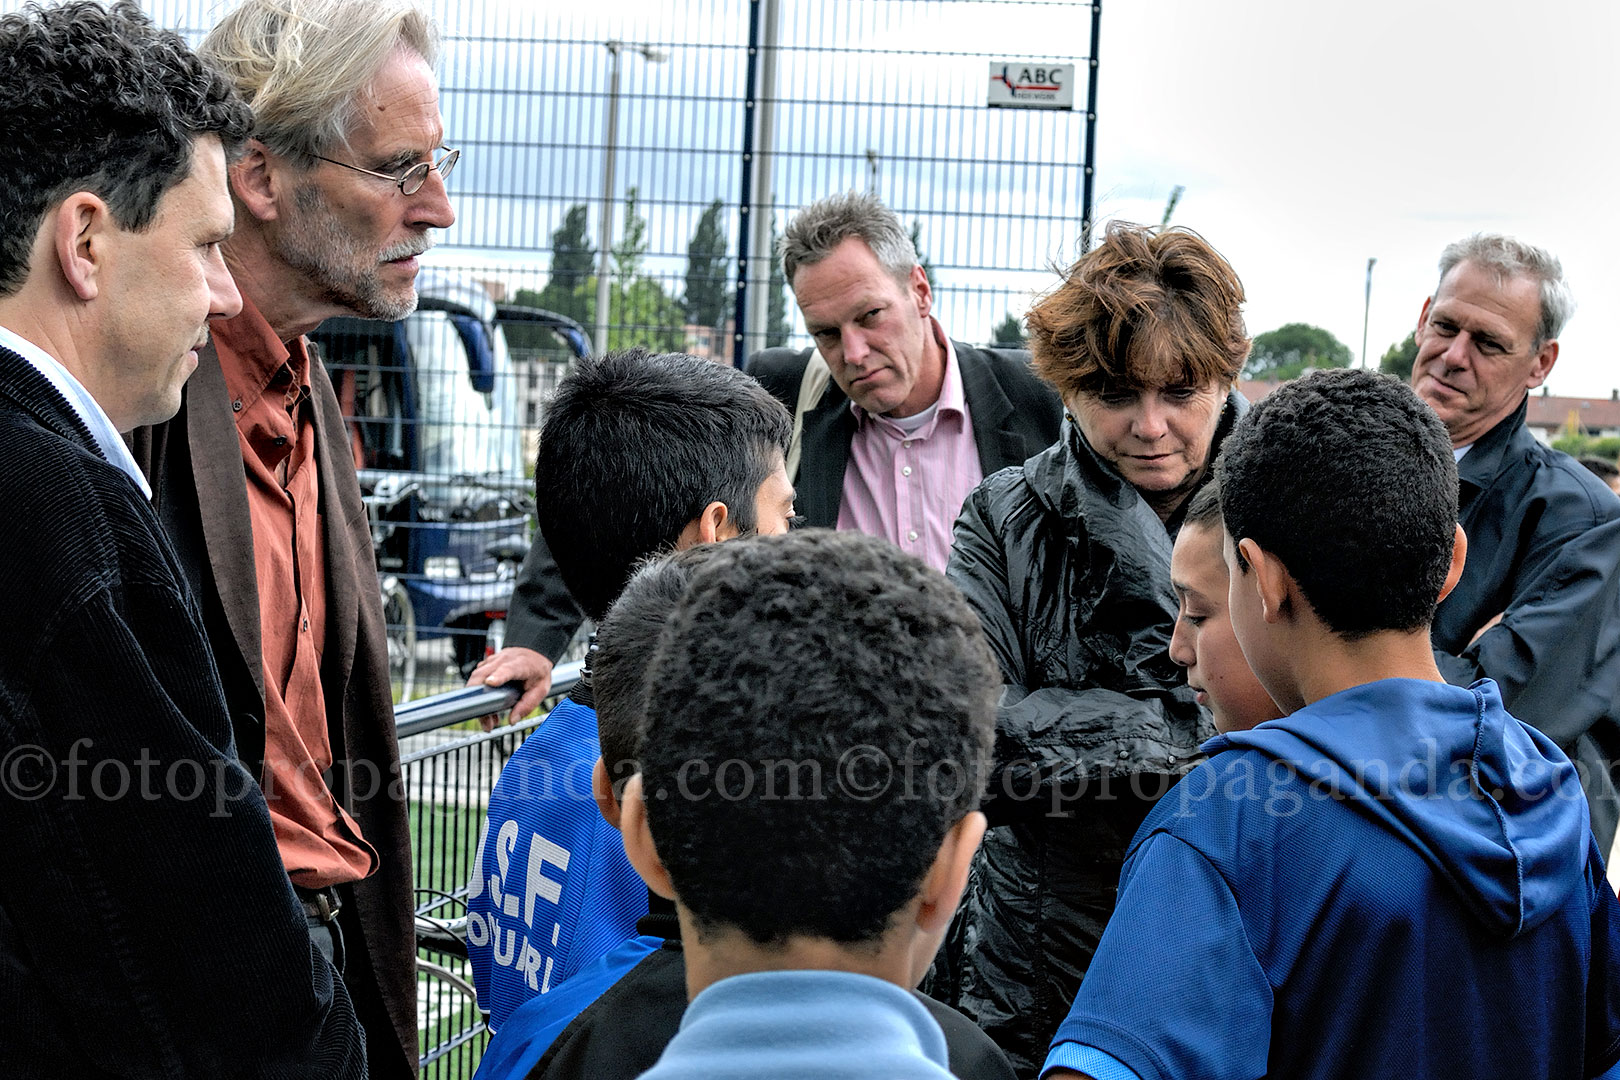 Oud-minister Vogelaar op bezoek in Malburgen in felle discussie met Marokkaanse jeugd